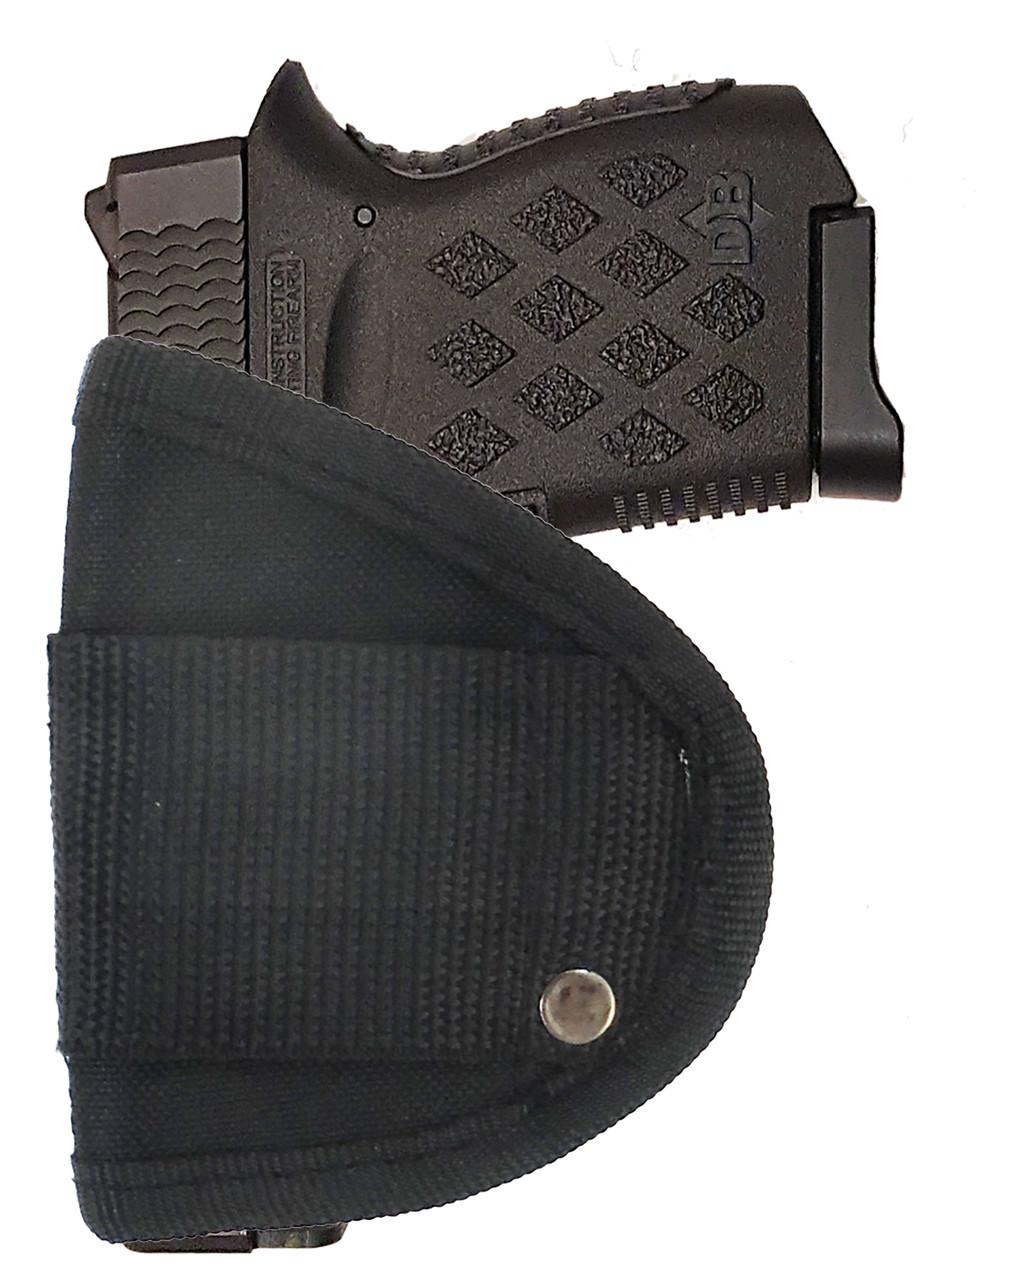 Inside Waistband Poly Sling Holster Fits Diamondback DB9 9mm IWB (S1)